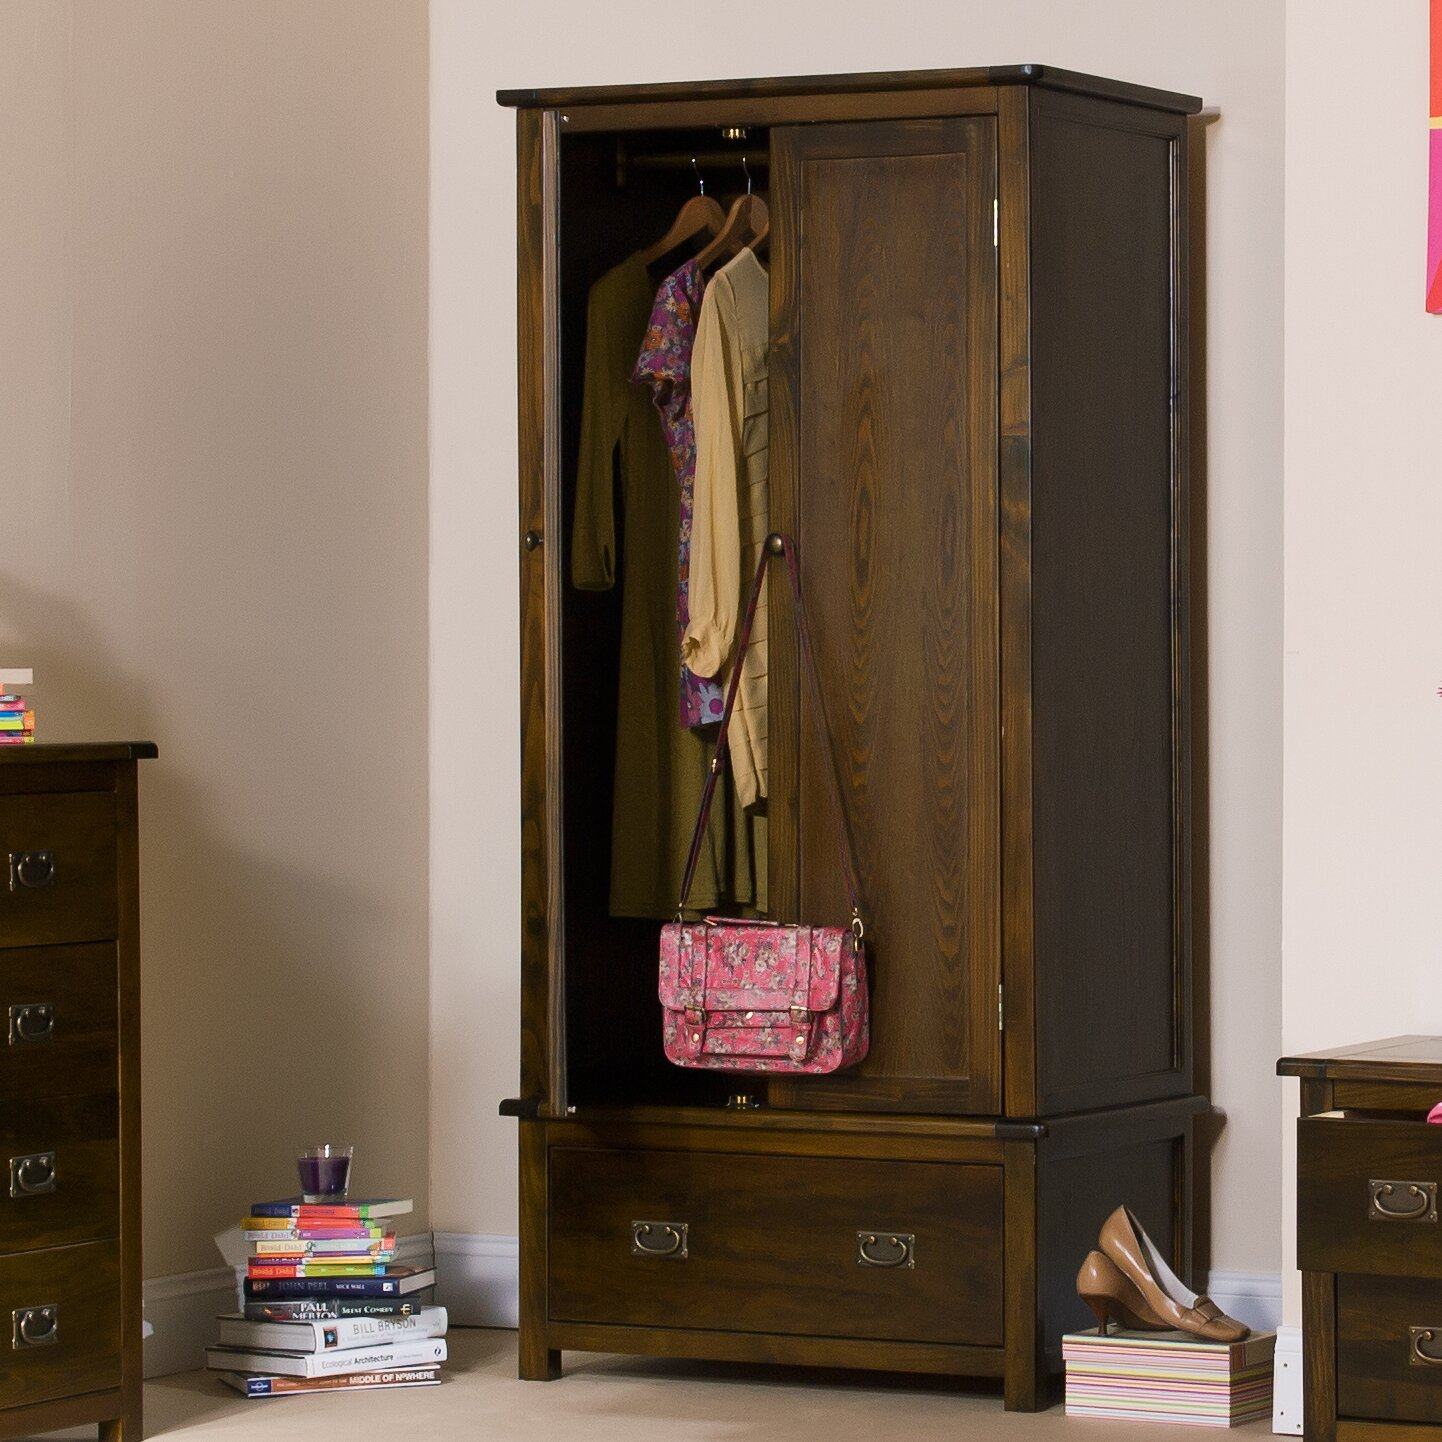 home haus kleiderschrank aster 190 cm h x 90 cm b x 55 cm t reviews. Black Bedroom Furniture Sets. Home Design Ideas